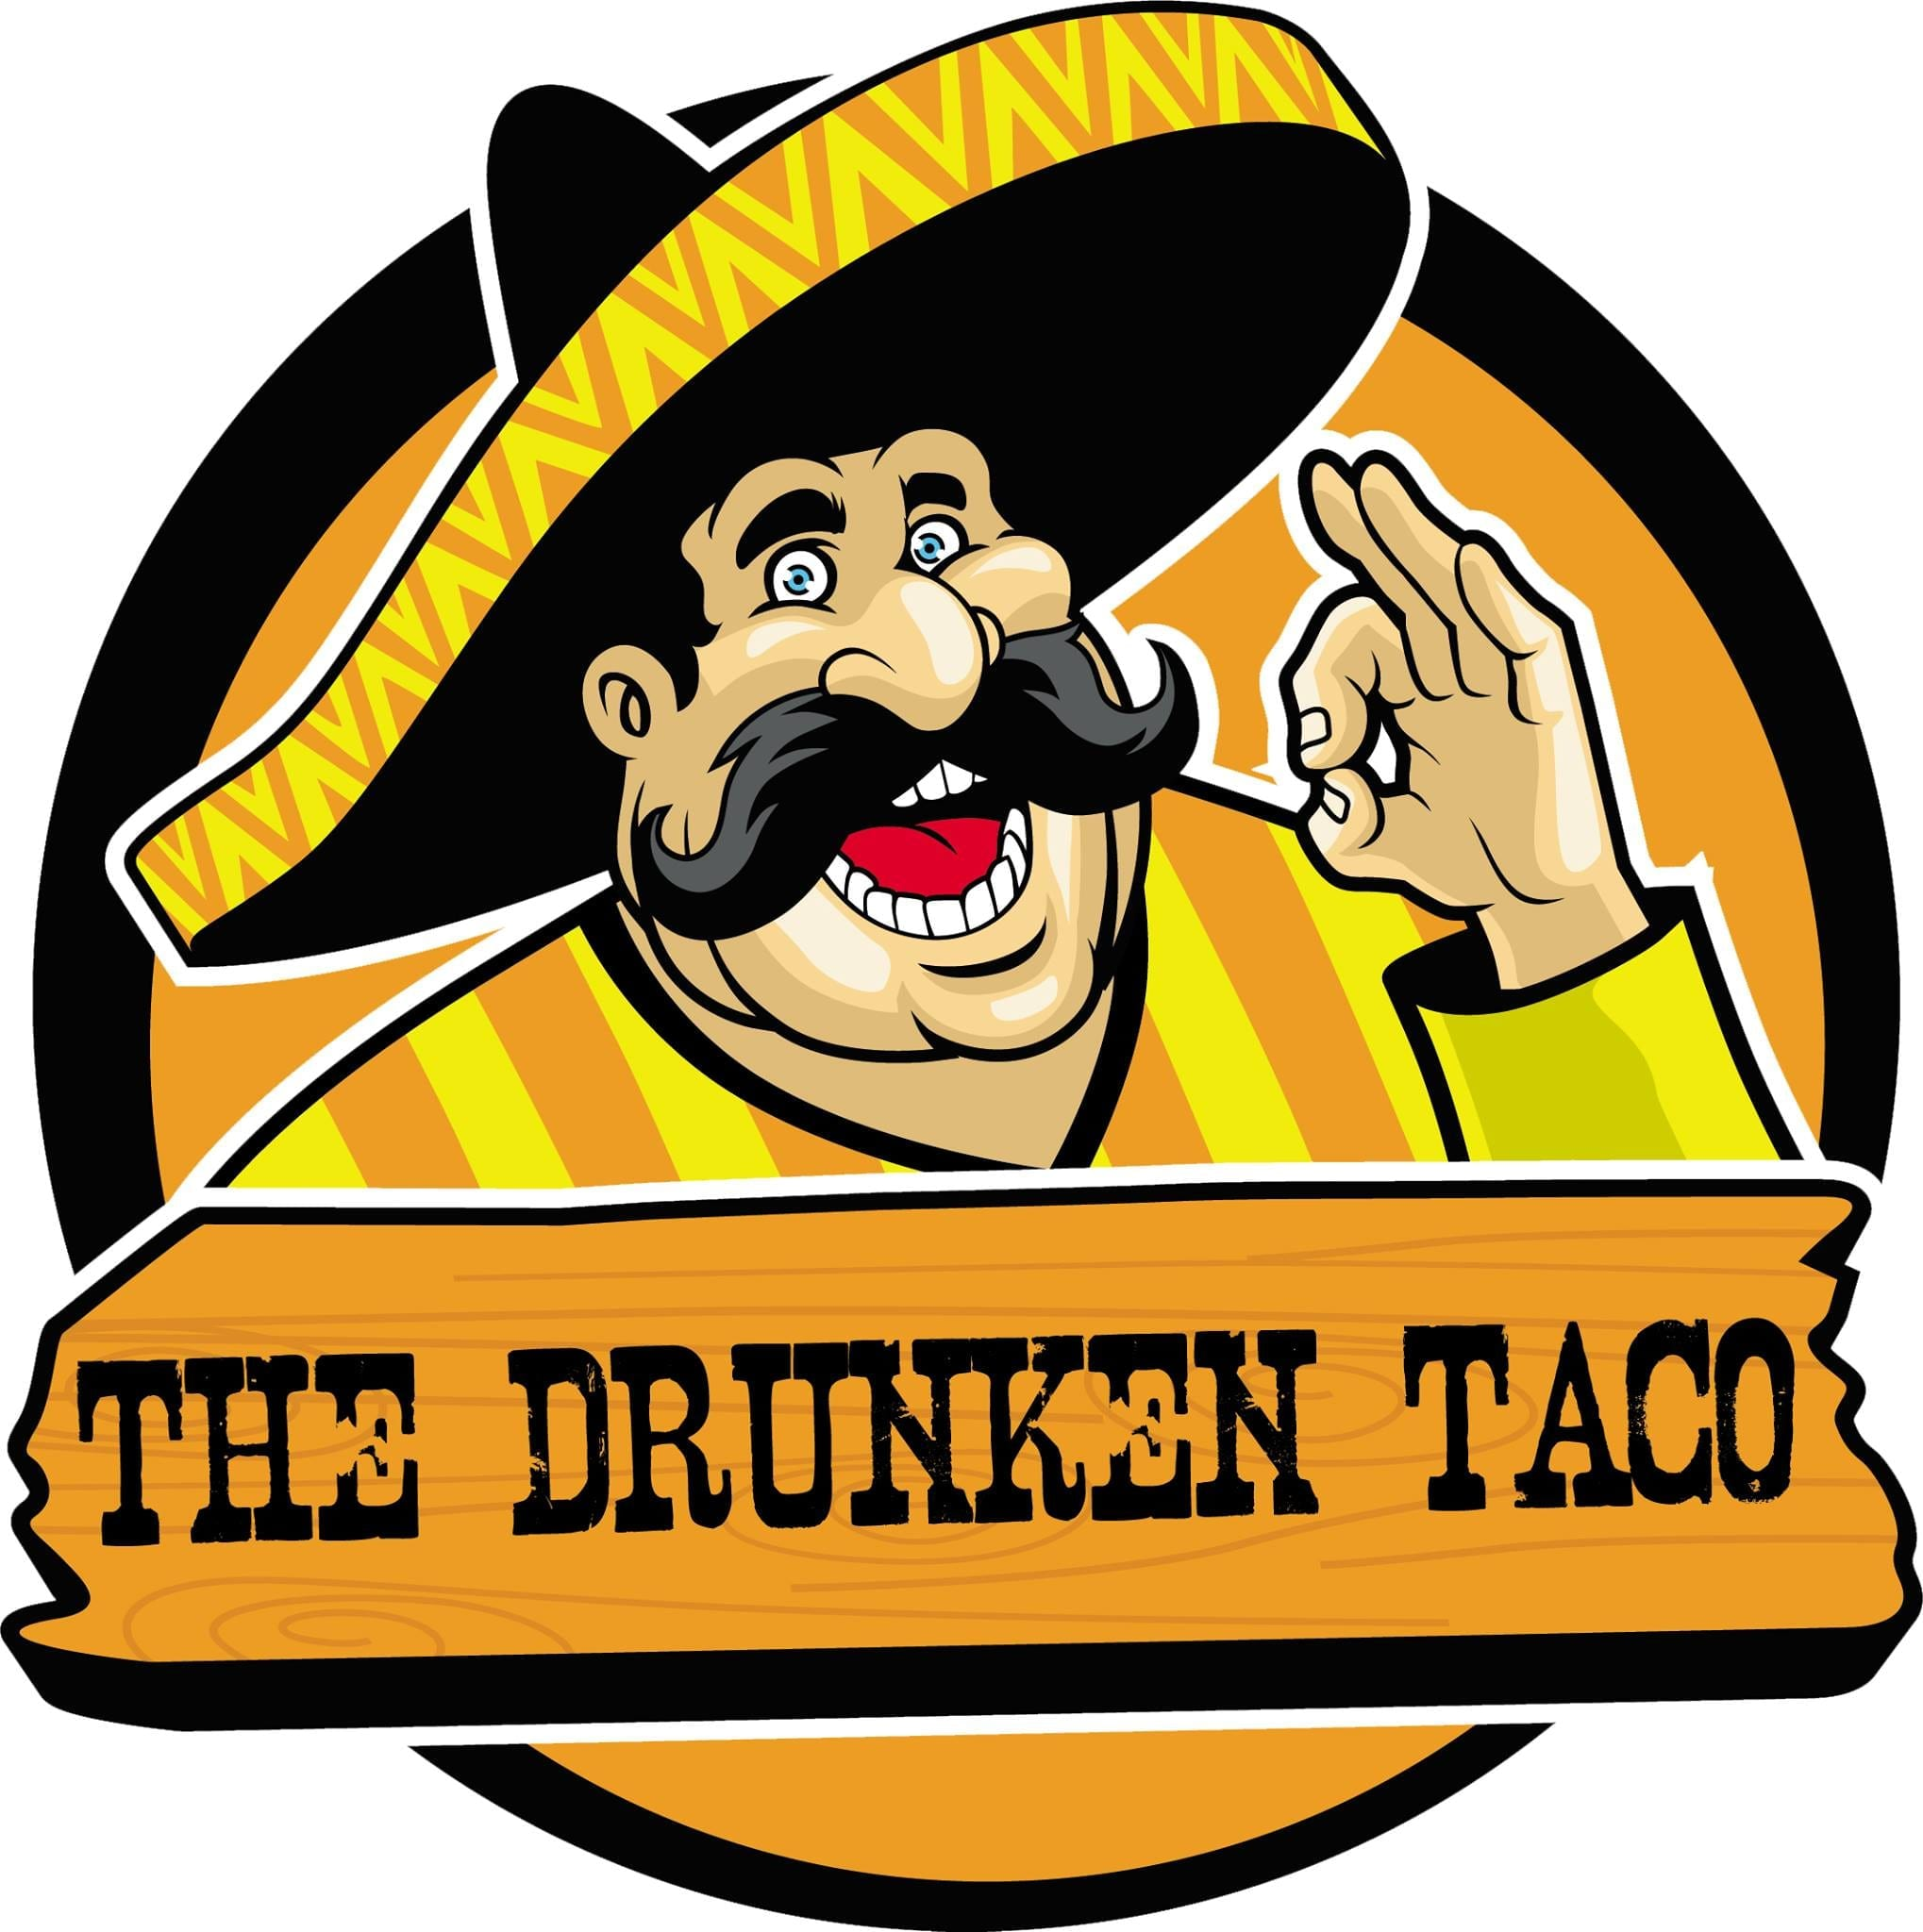 drunken taco logo